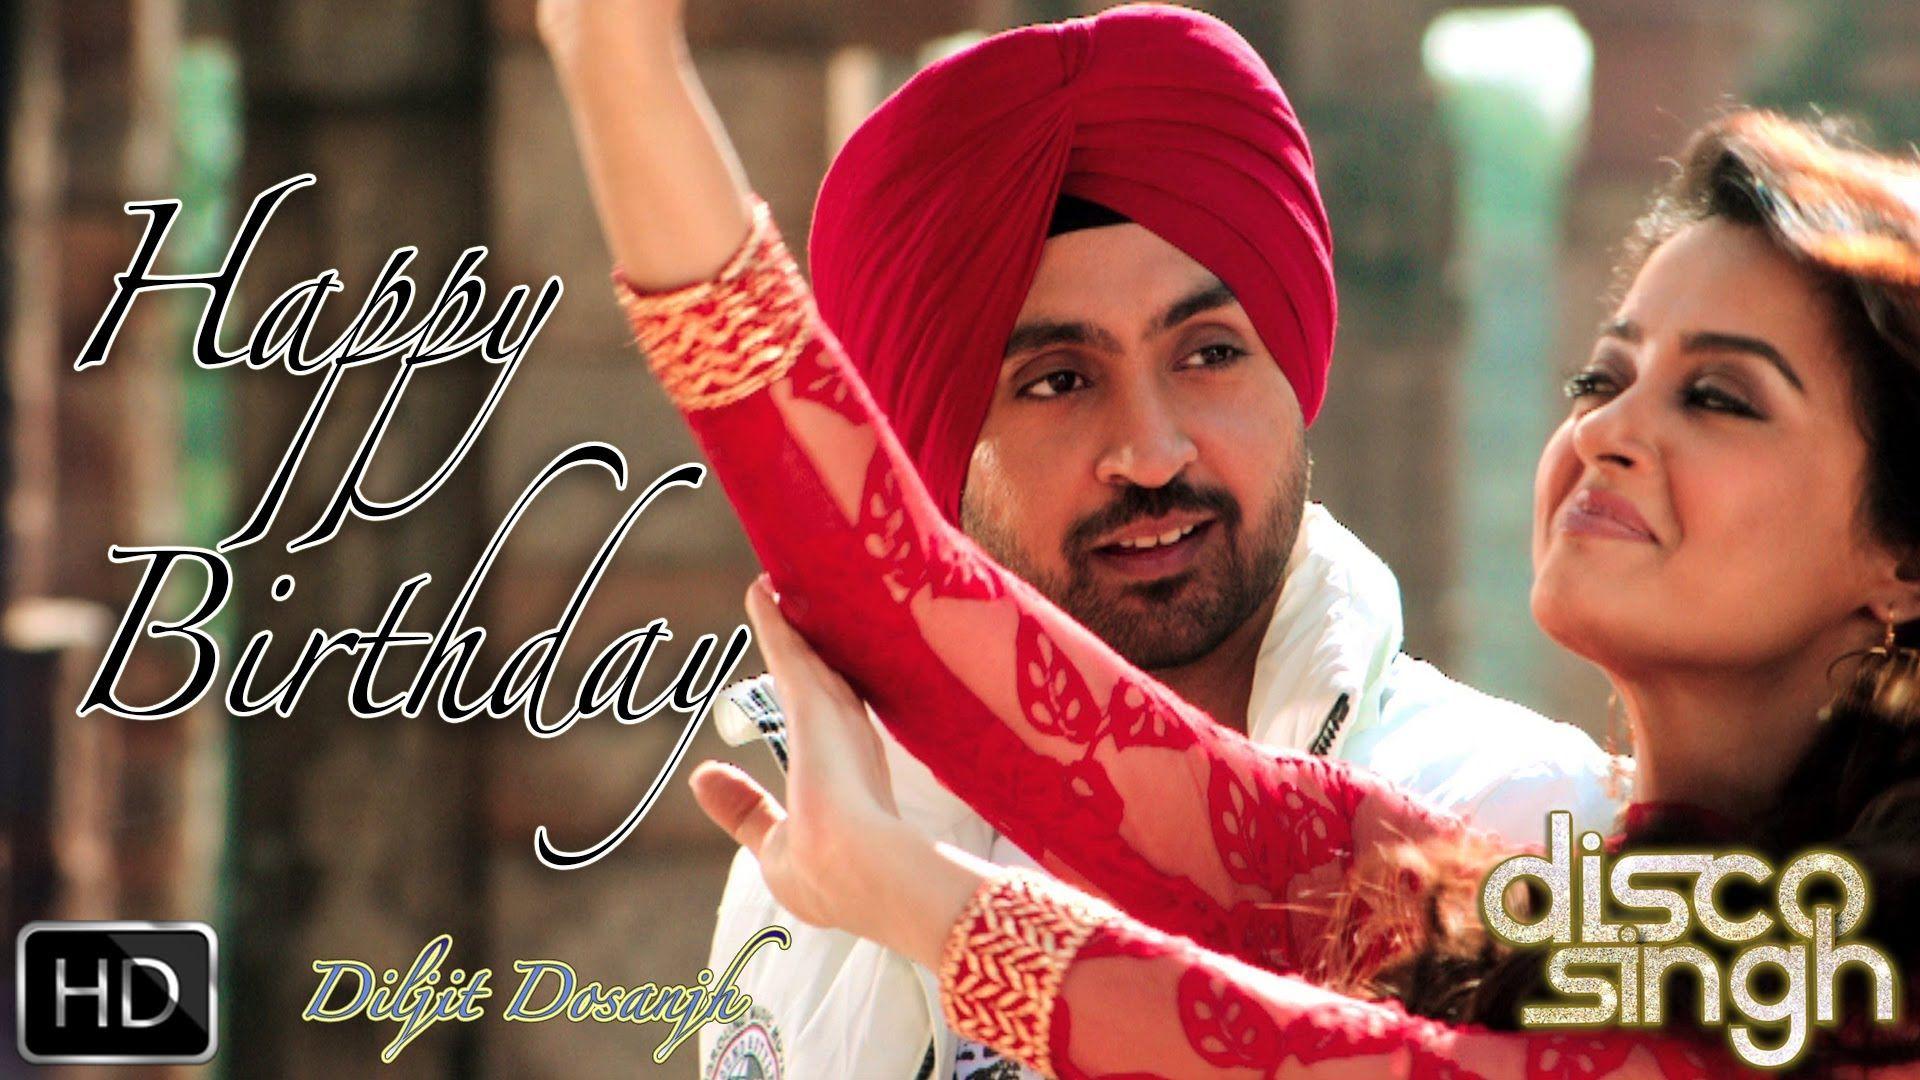 Happy birthday diljit punjabi song mp3 download